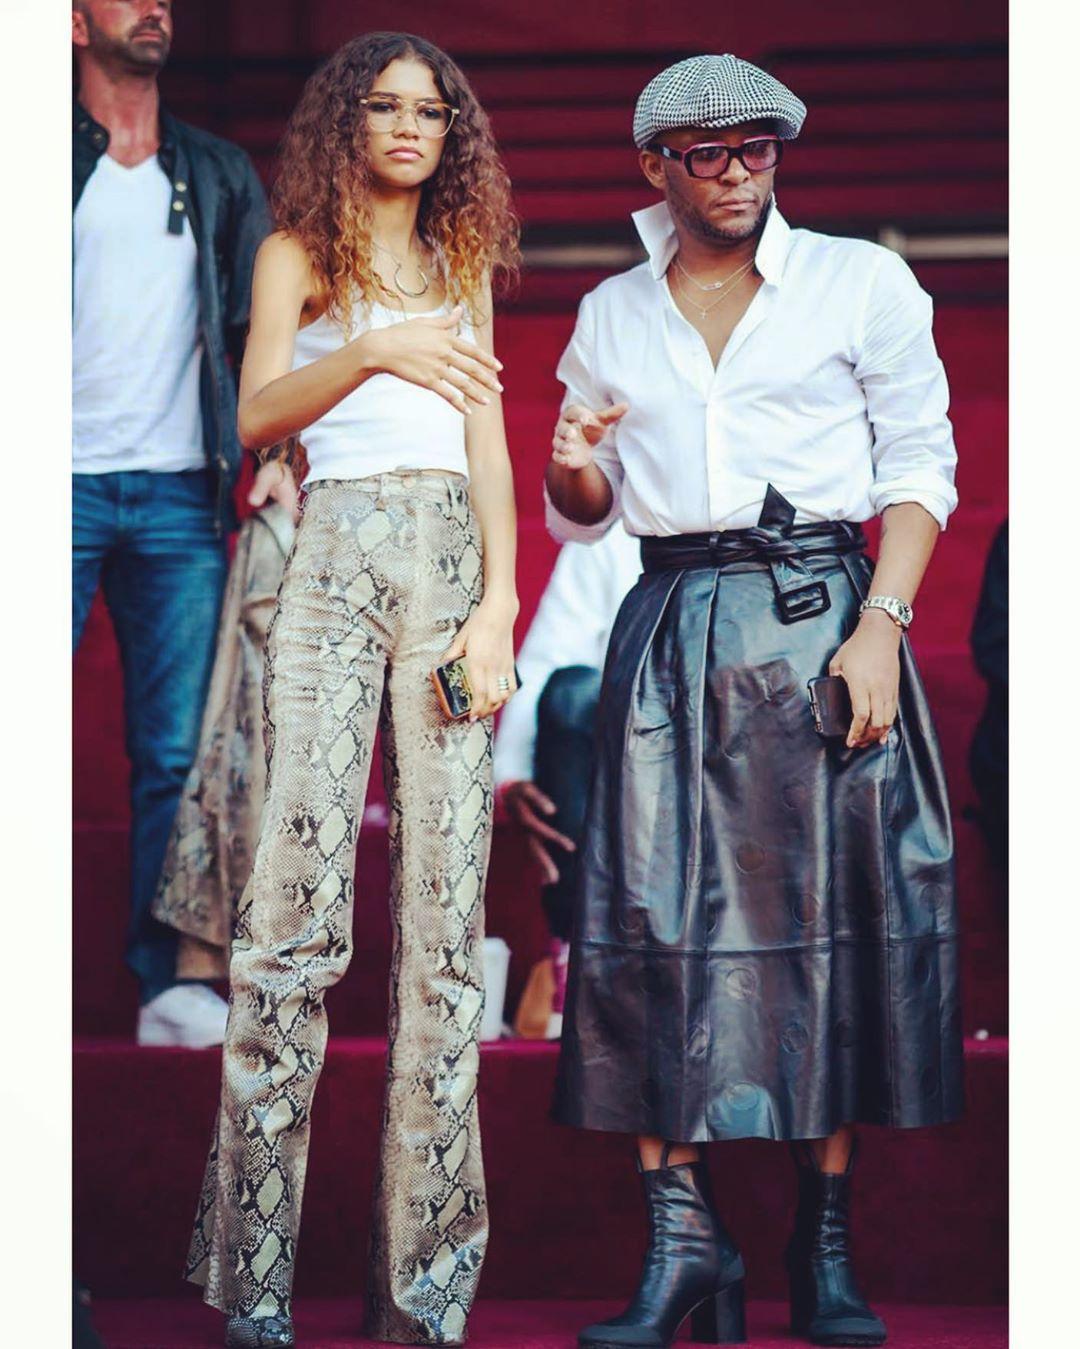 zendaya-law-roach-leather-skirt-snake-print-pant-hollywood-fashion-2019